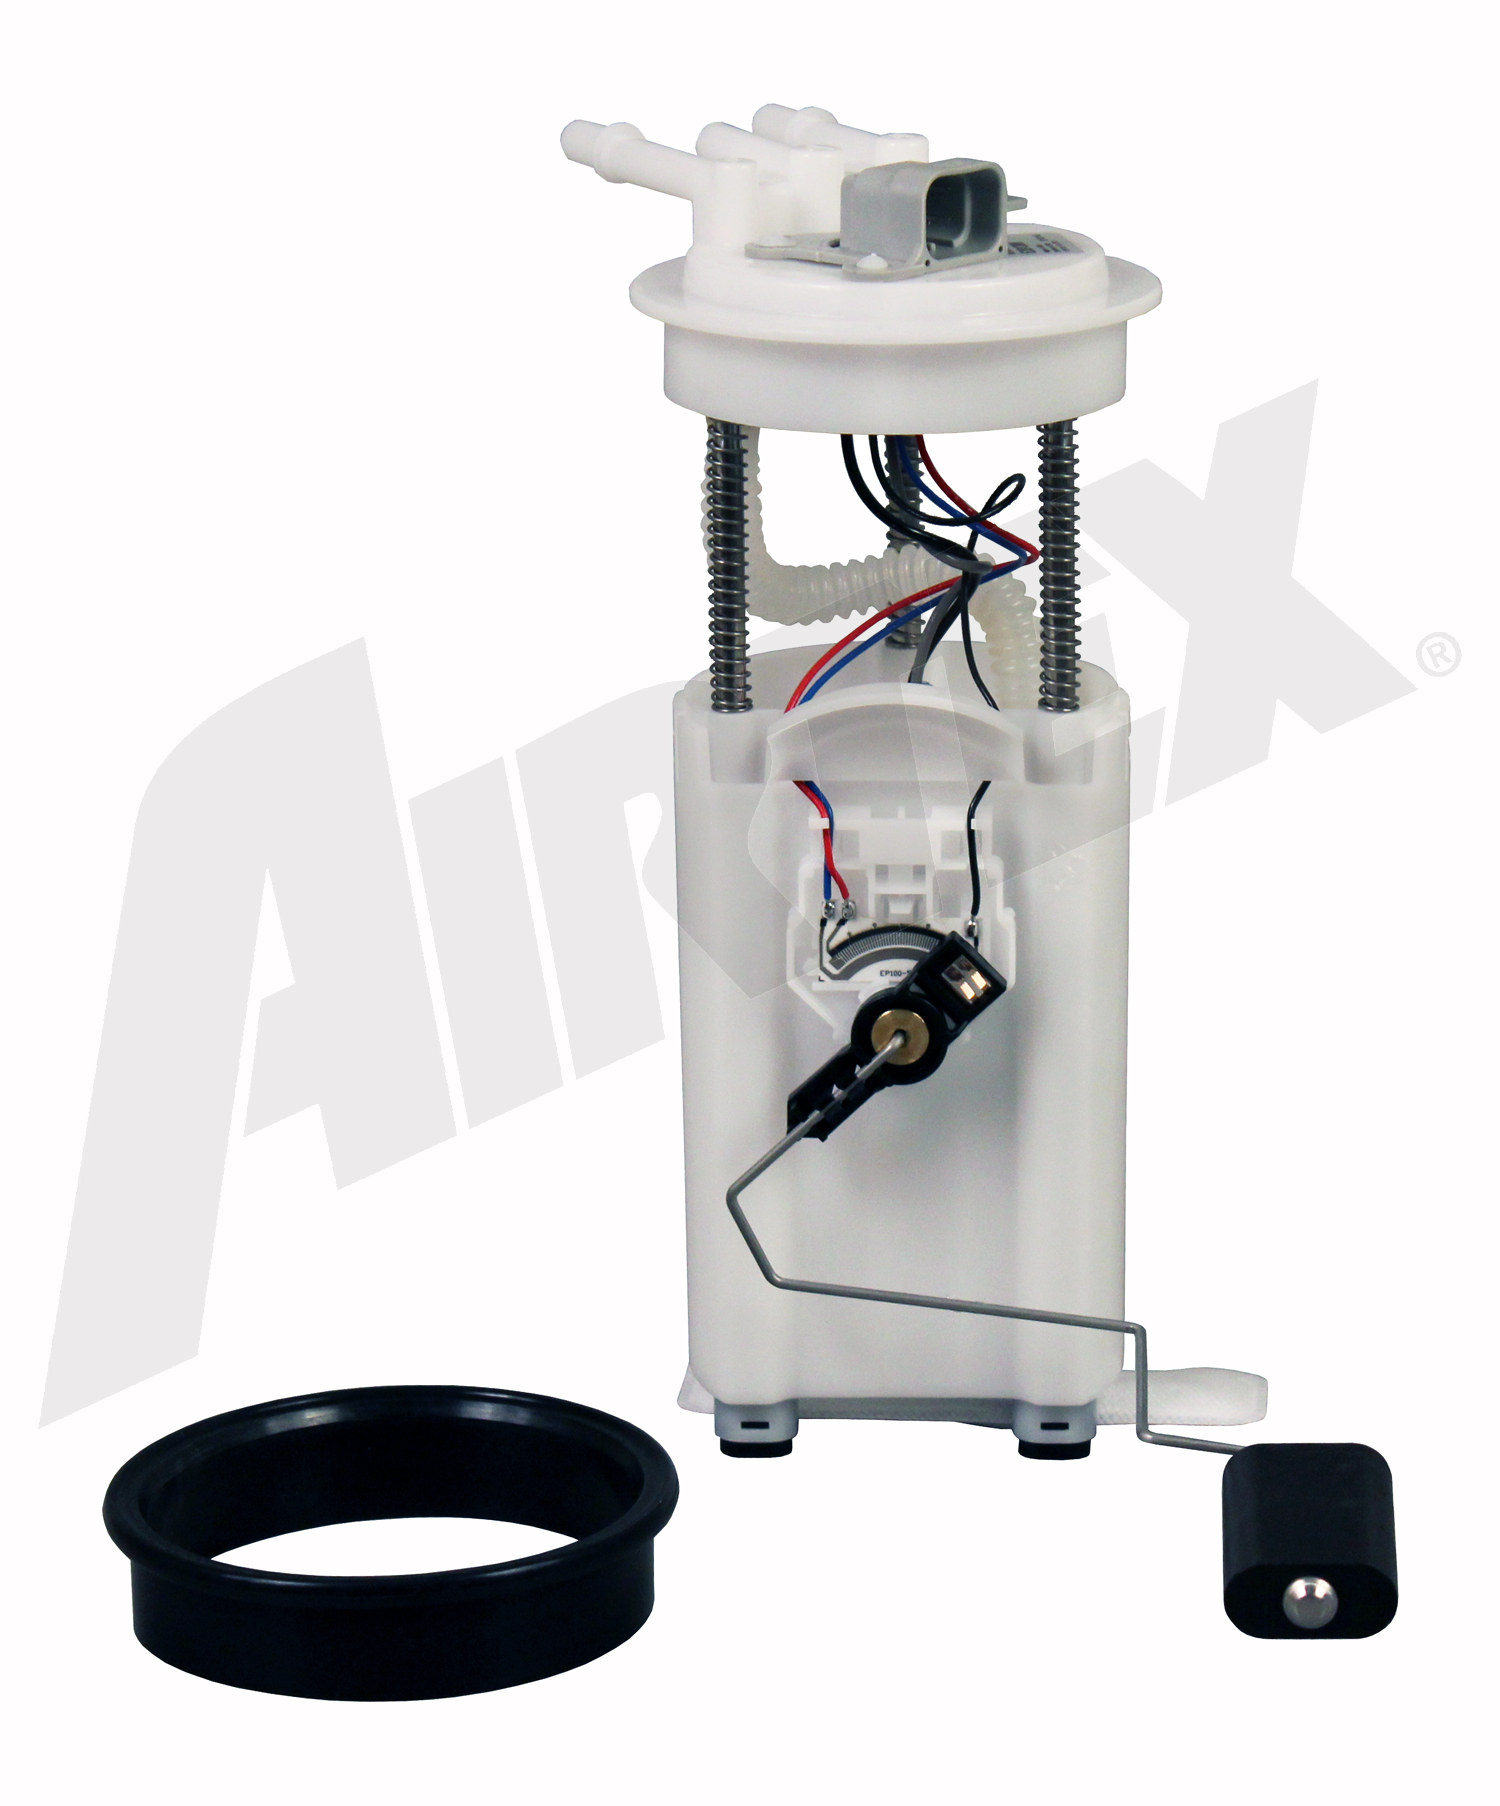 Image of Airtex Fuel Pumps E3913M Fuel Pump Module Assembly Fits 1994-1996 Cadillac DeVille